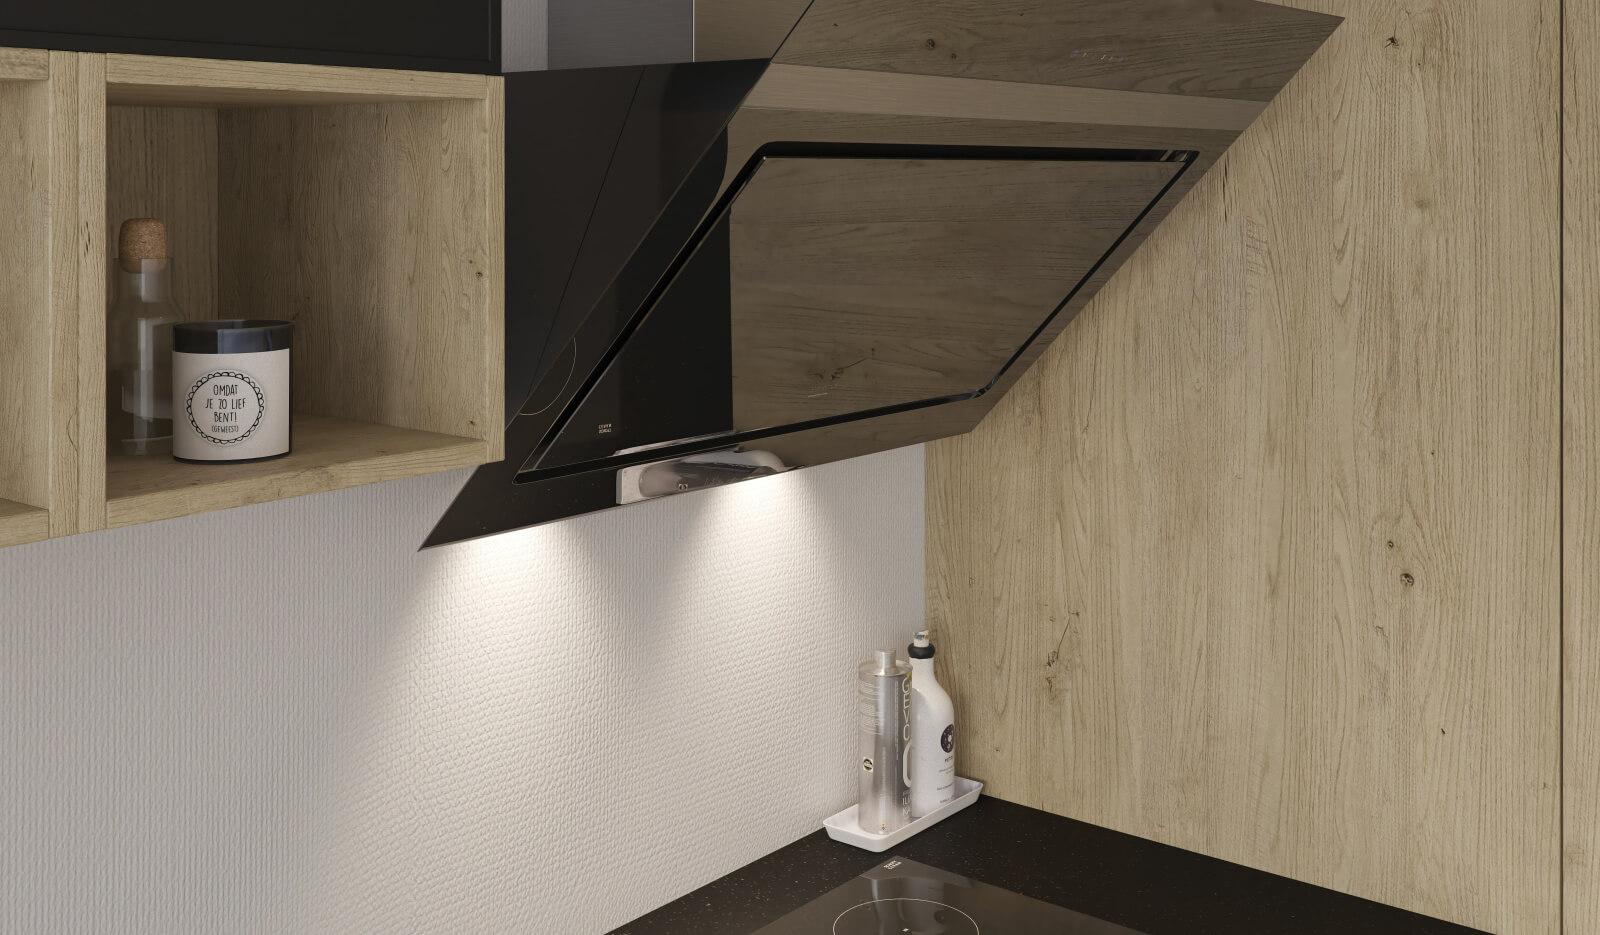 Keuken Brighton zwart - afzuigkap schuinwandmodel